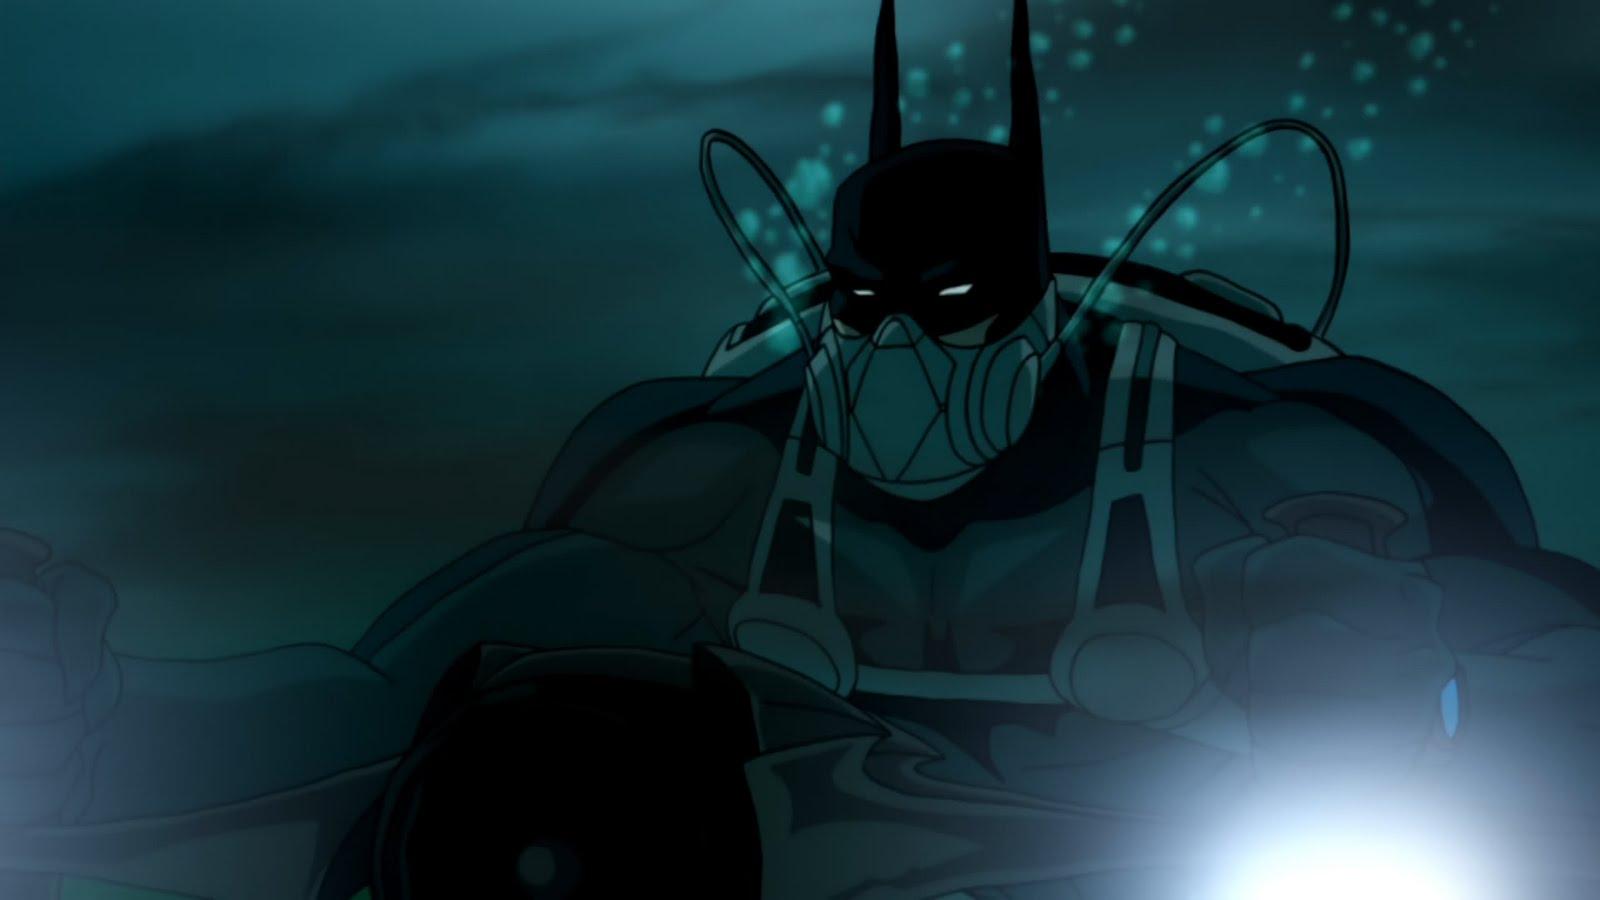 ExplodingMinds: Some Cool Never seen Batman Wallpapers..